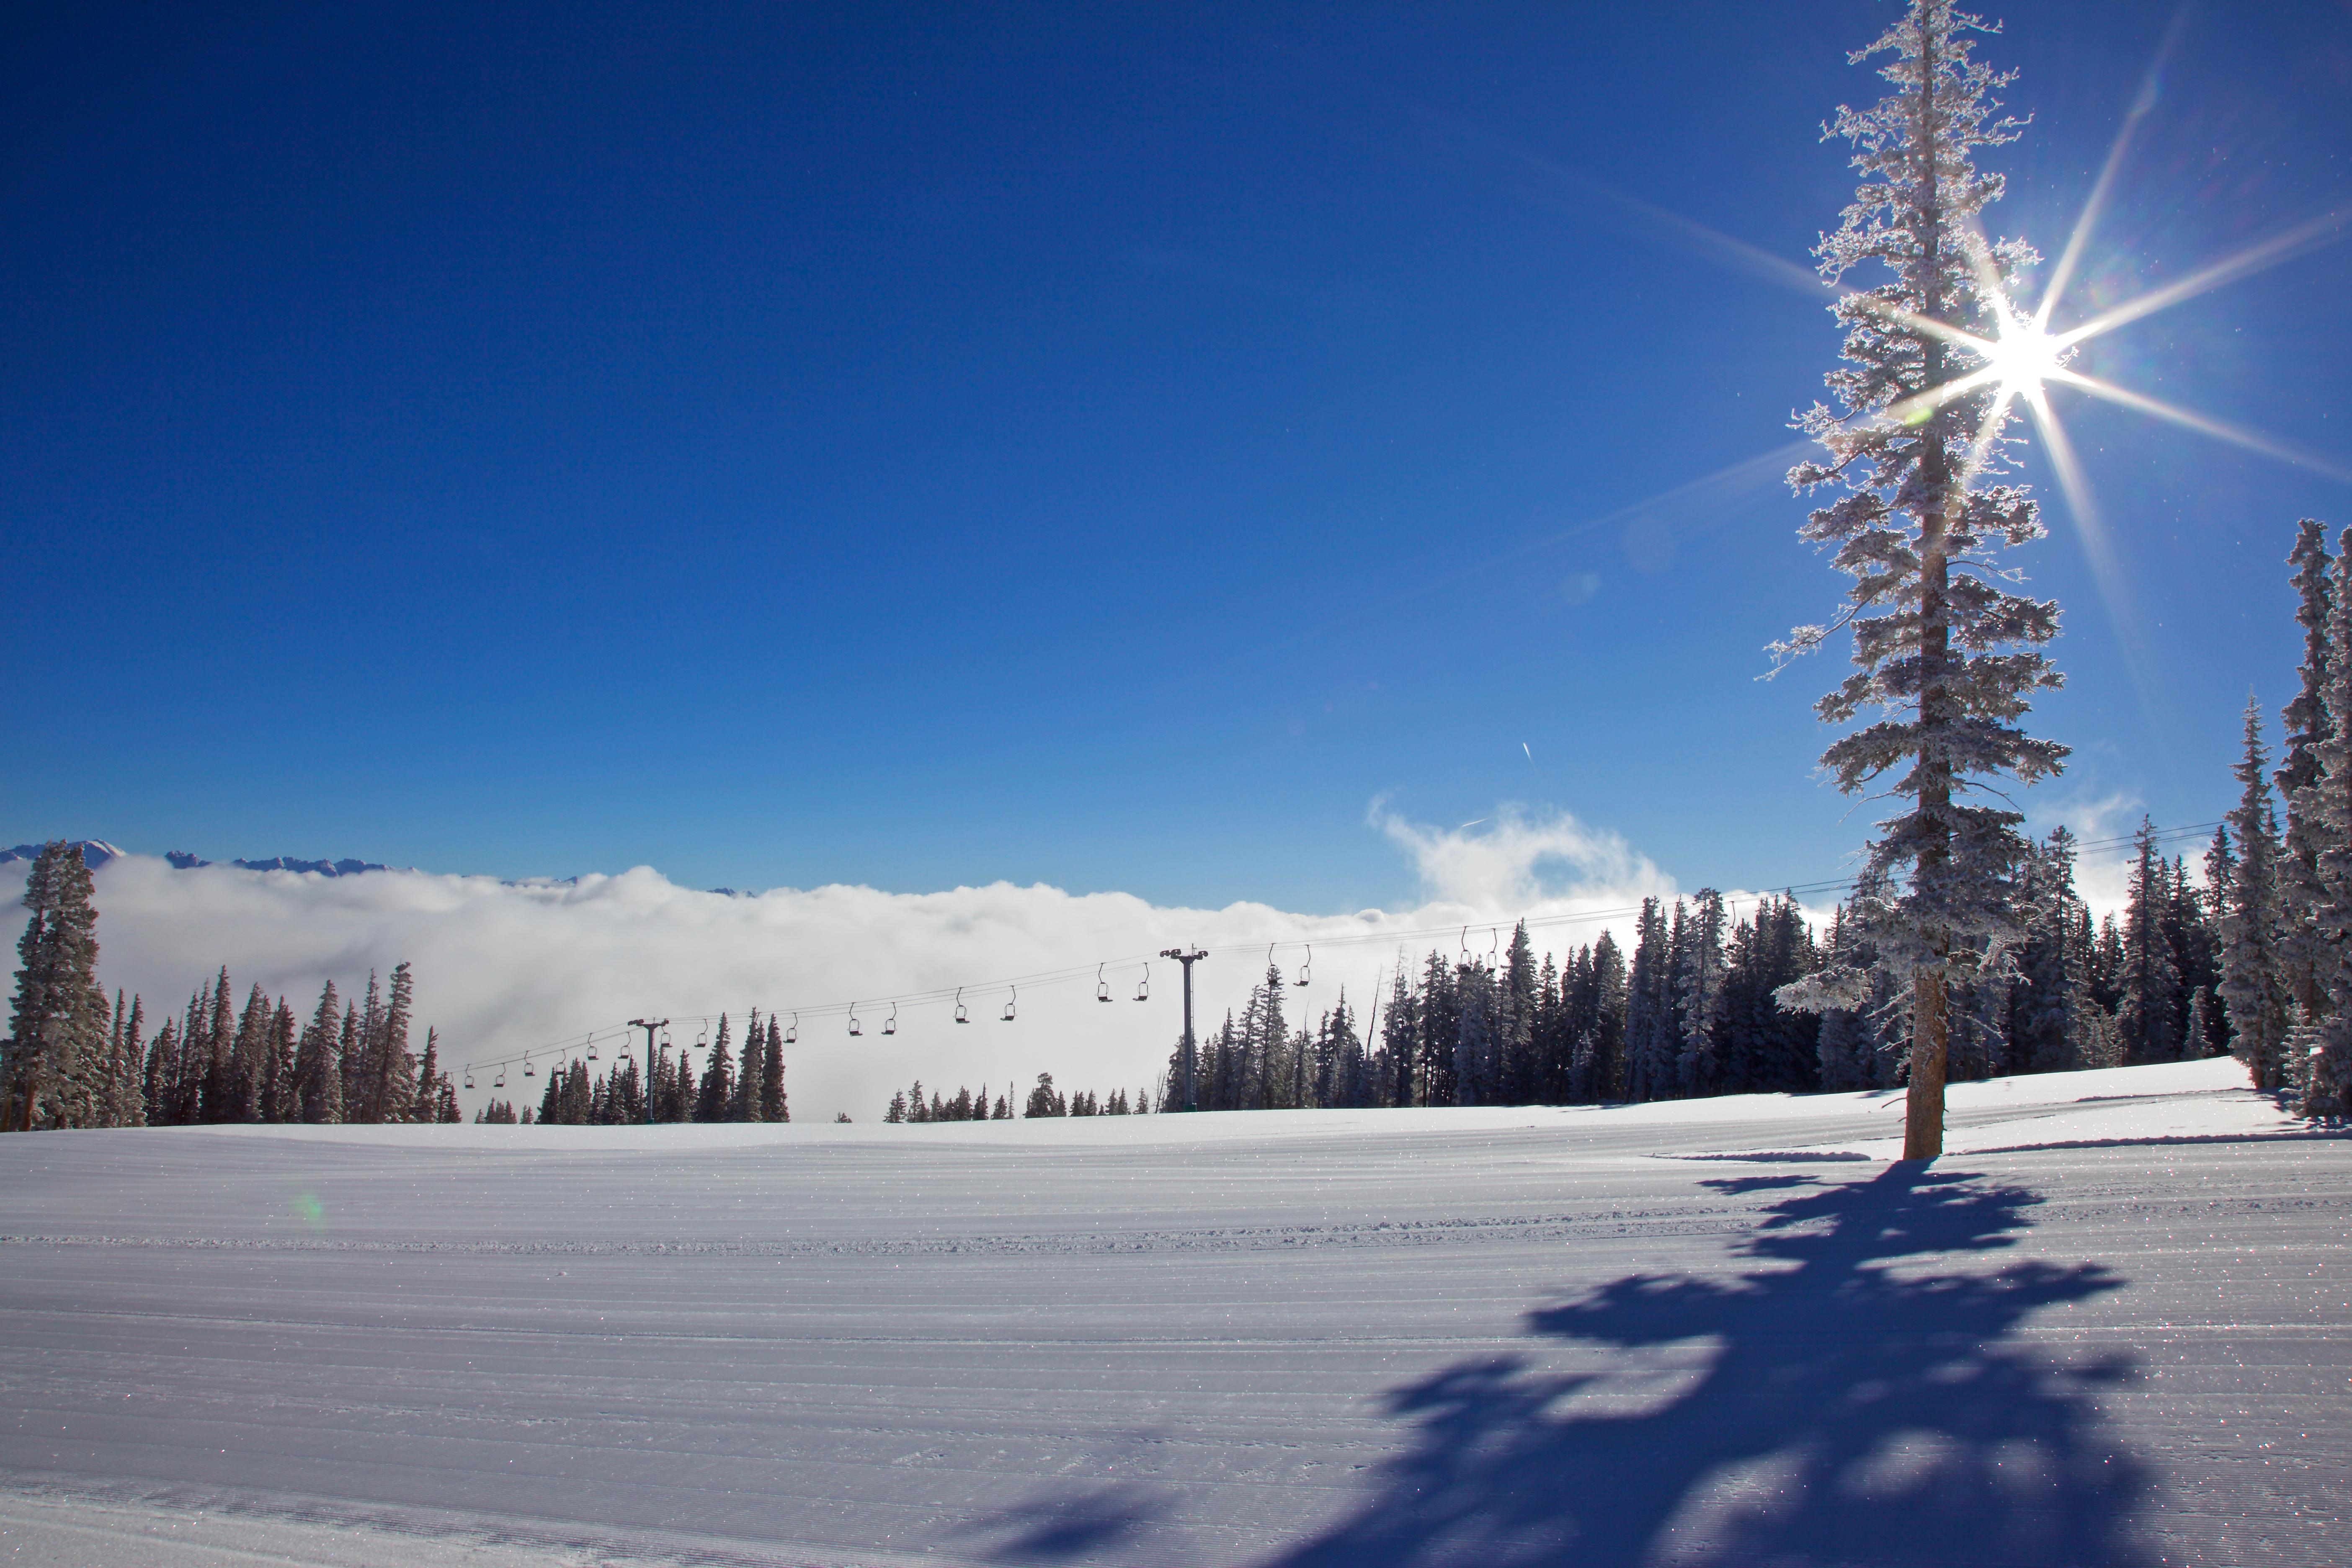 20170405_BC_Snow Sunrise Scenic_Trees_Ch